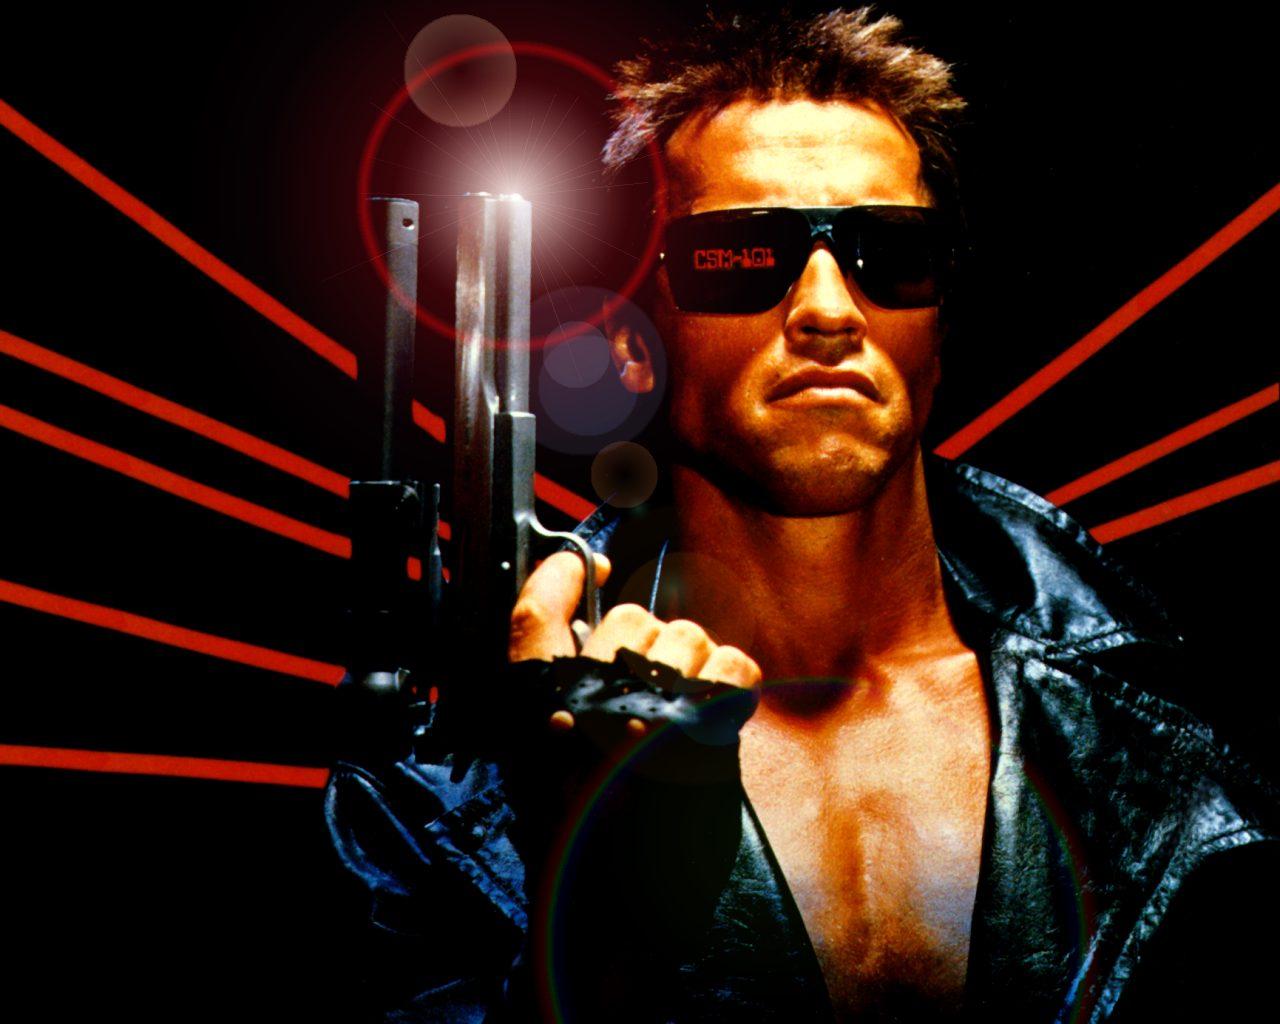 Arnold Schwarzenegger Terminator 2 Wallpaper 15